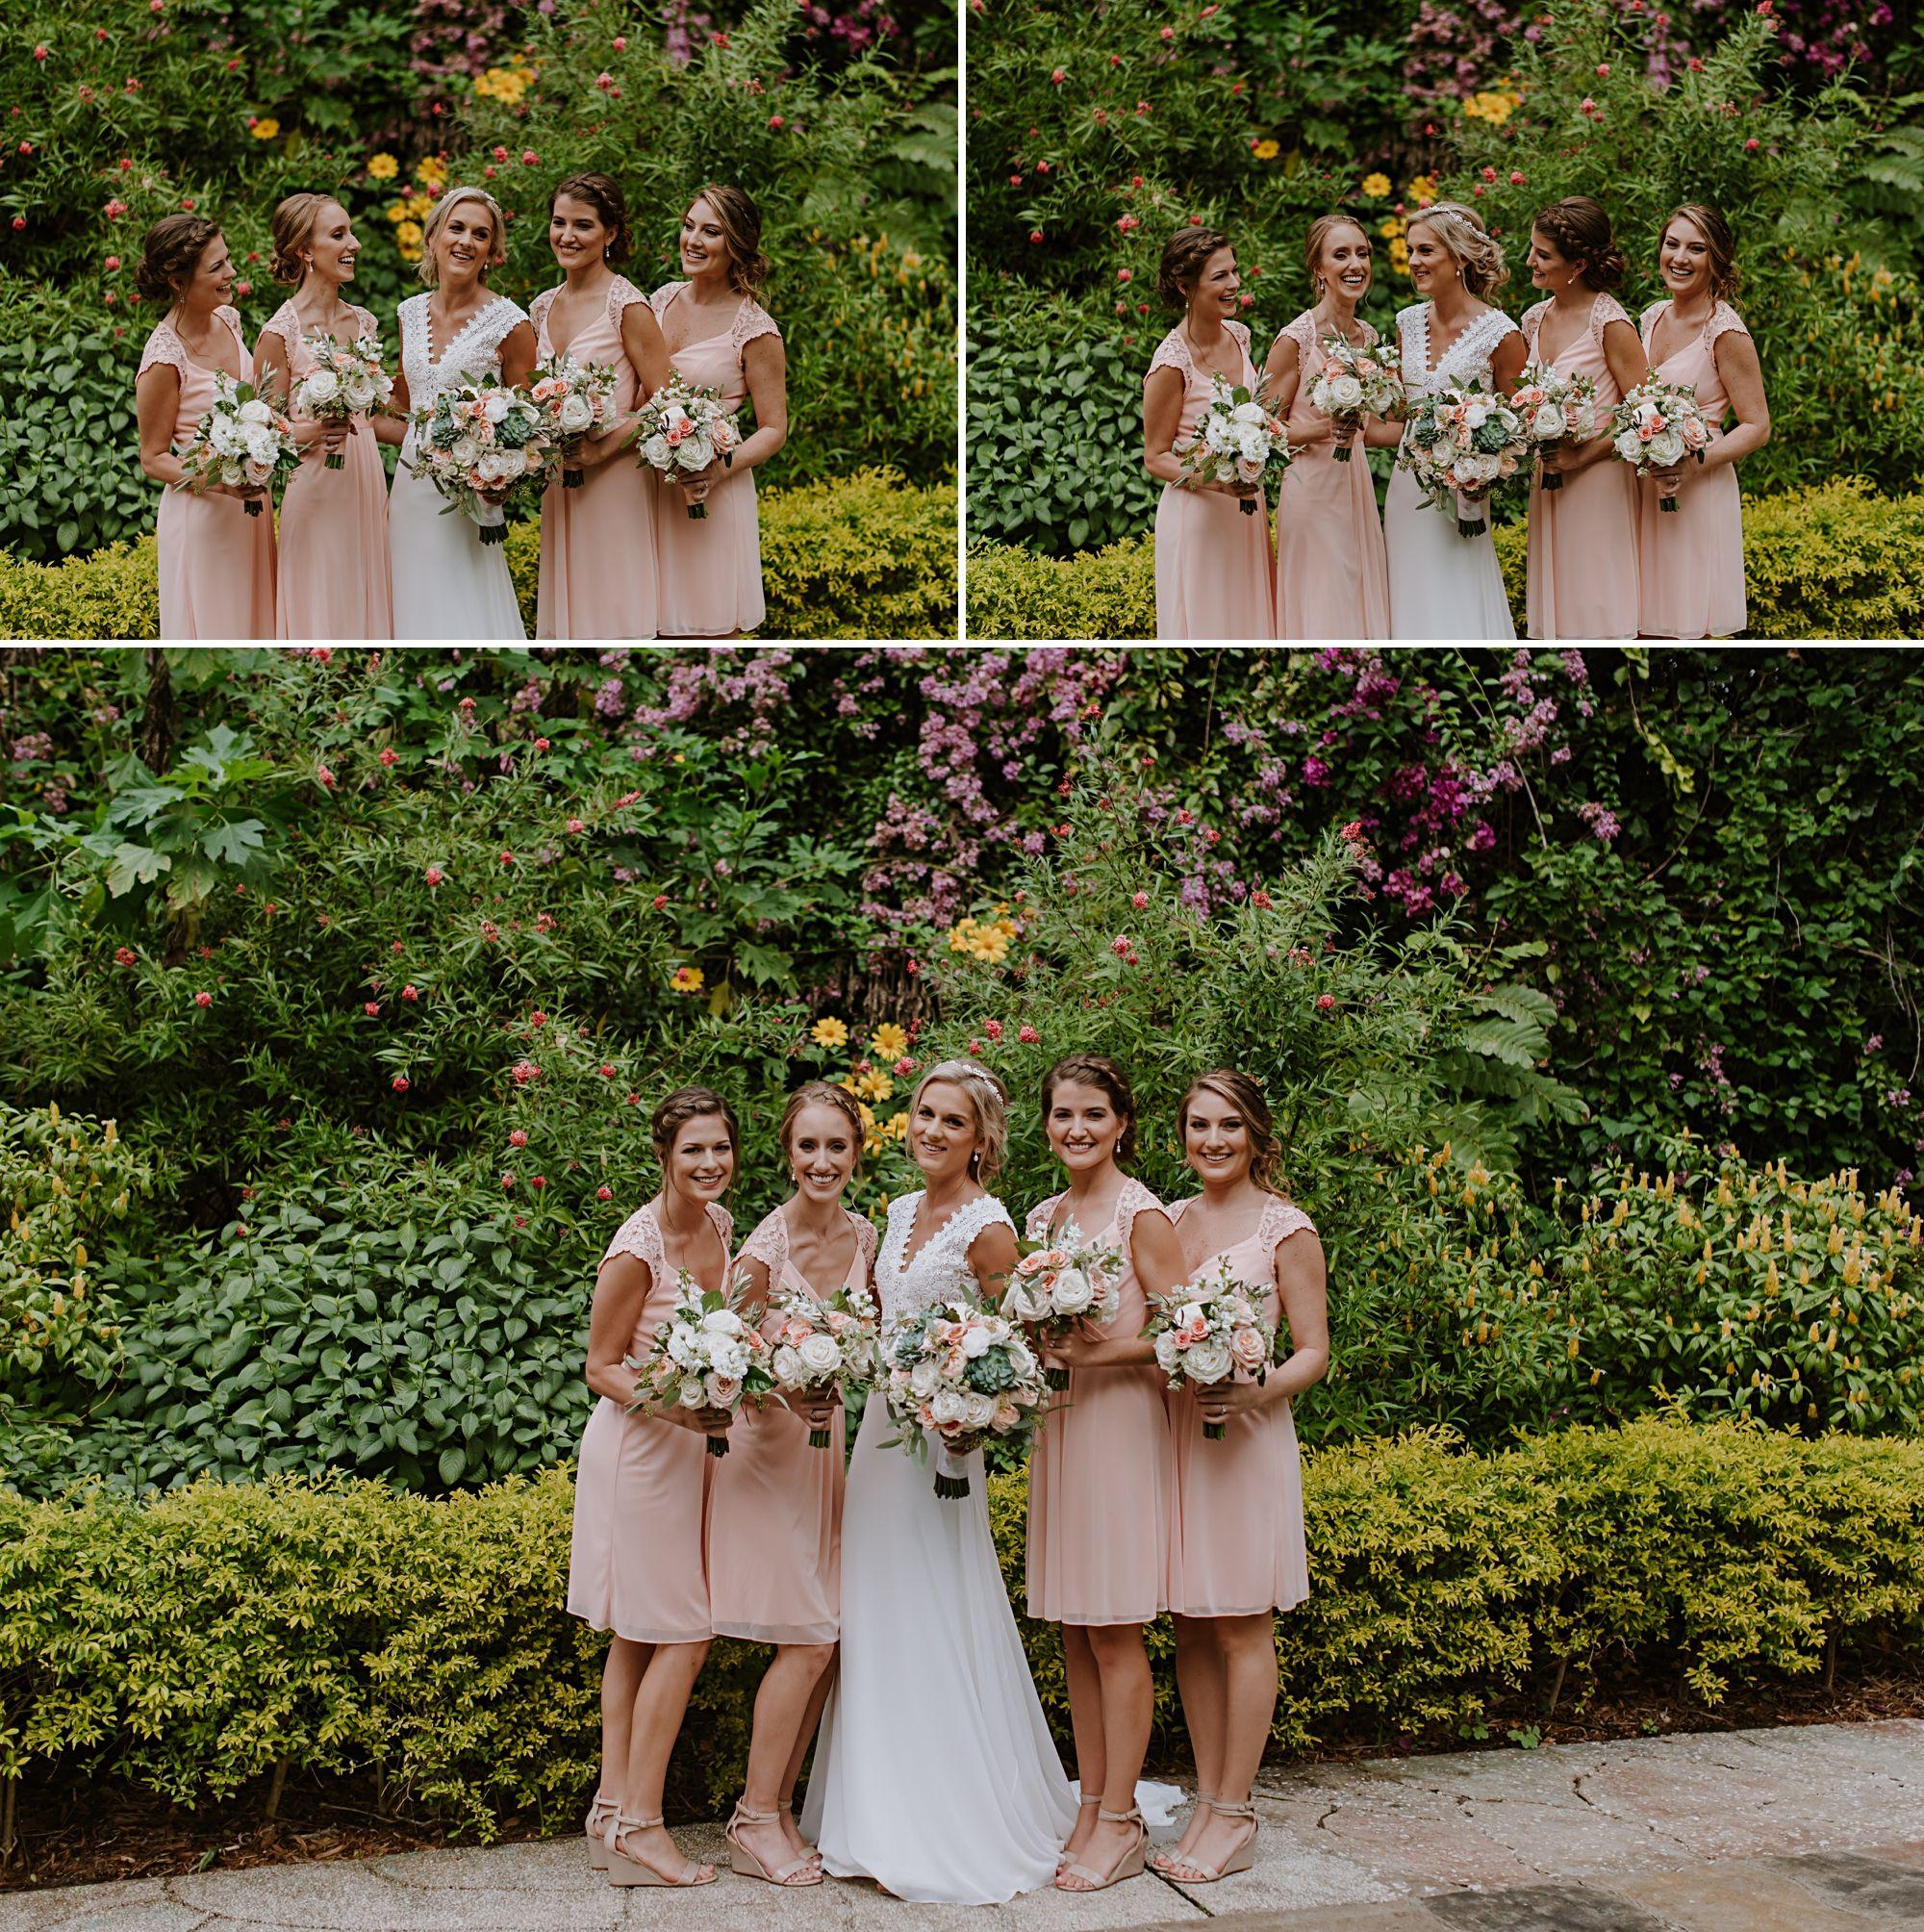 fun bridesmaid photos at Sunken Gardens St. Pete, FL